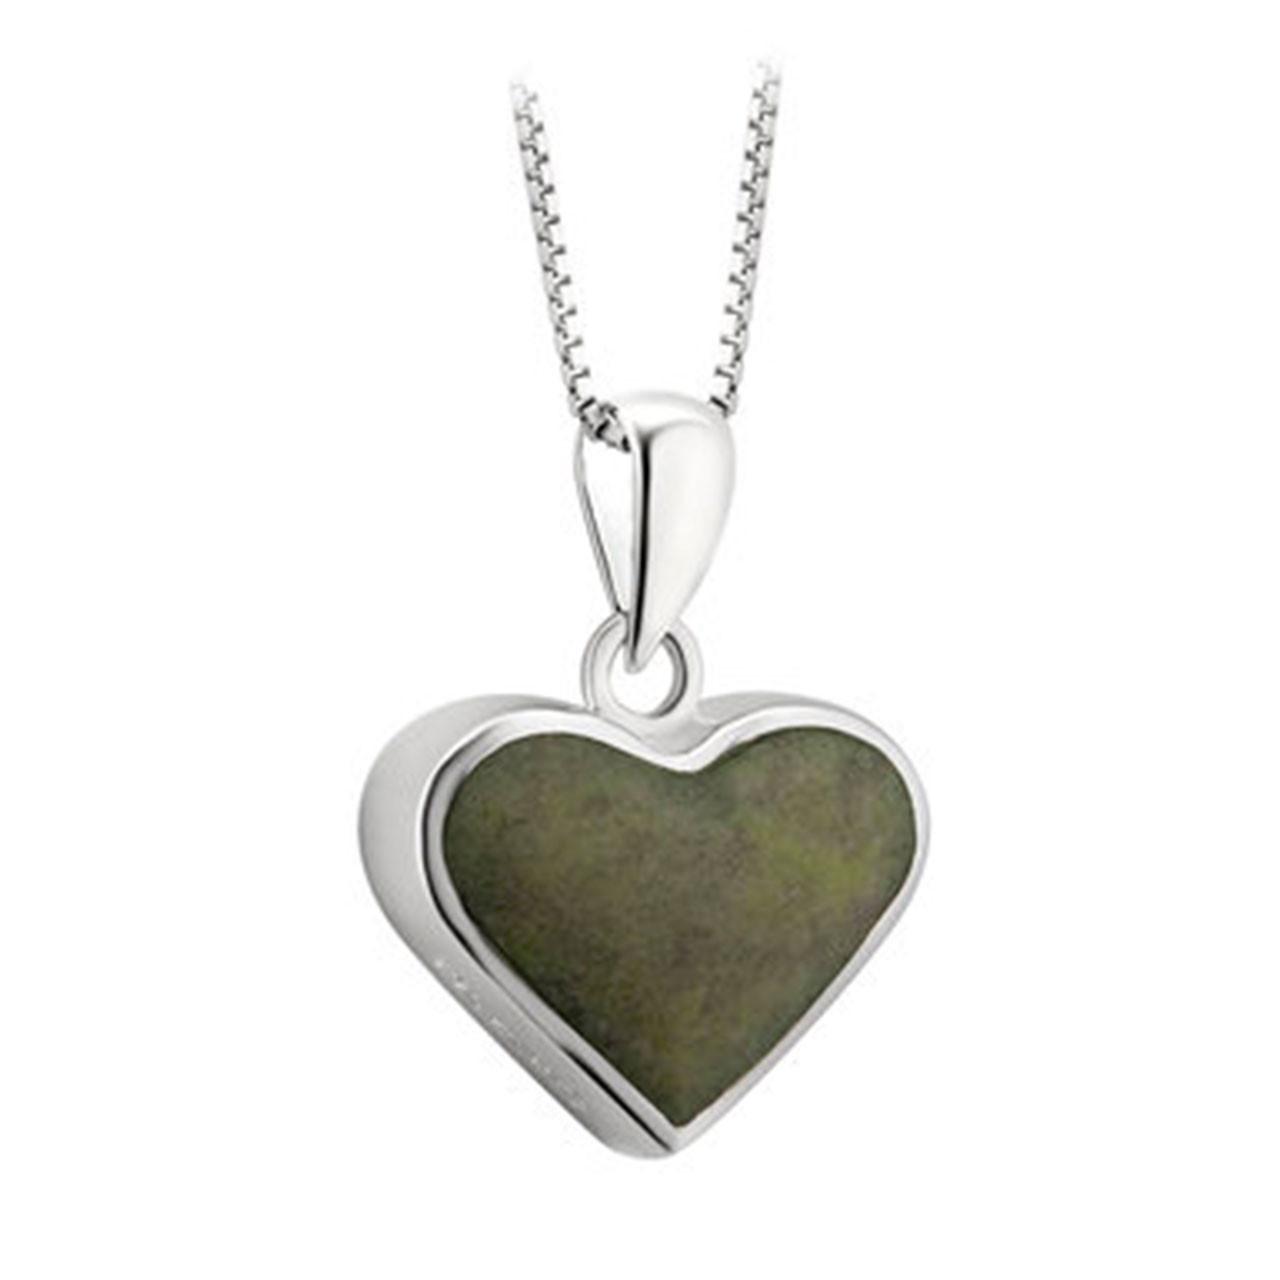 Heart Connemara Pendant